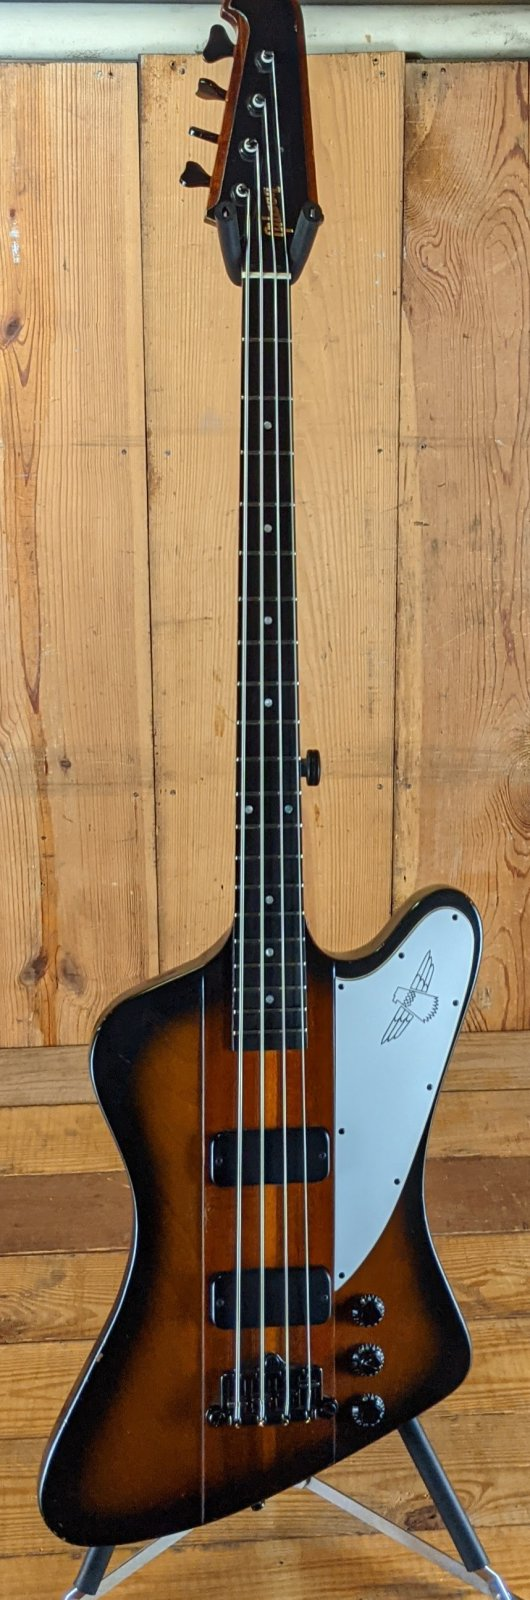 1997 Gibson Thunderbird IV